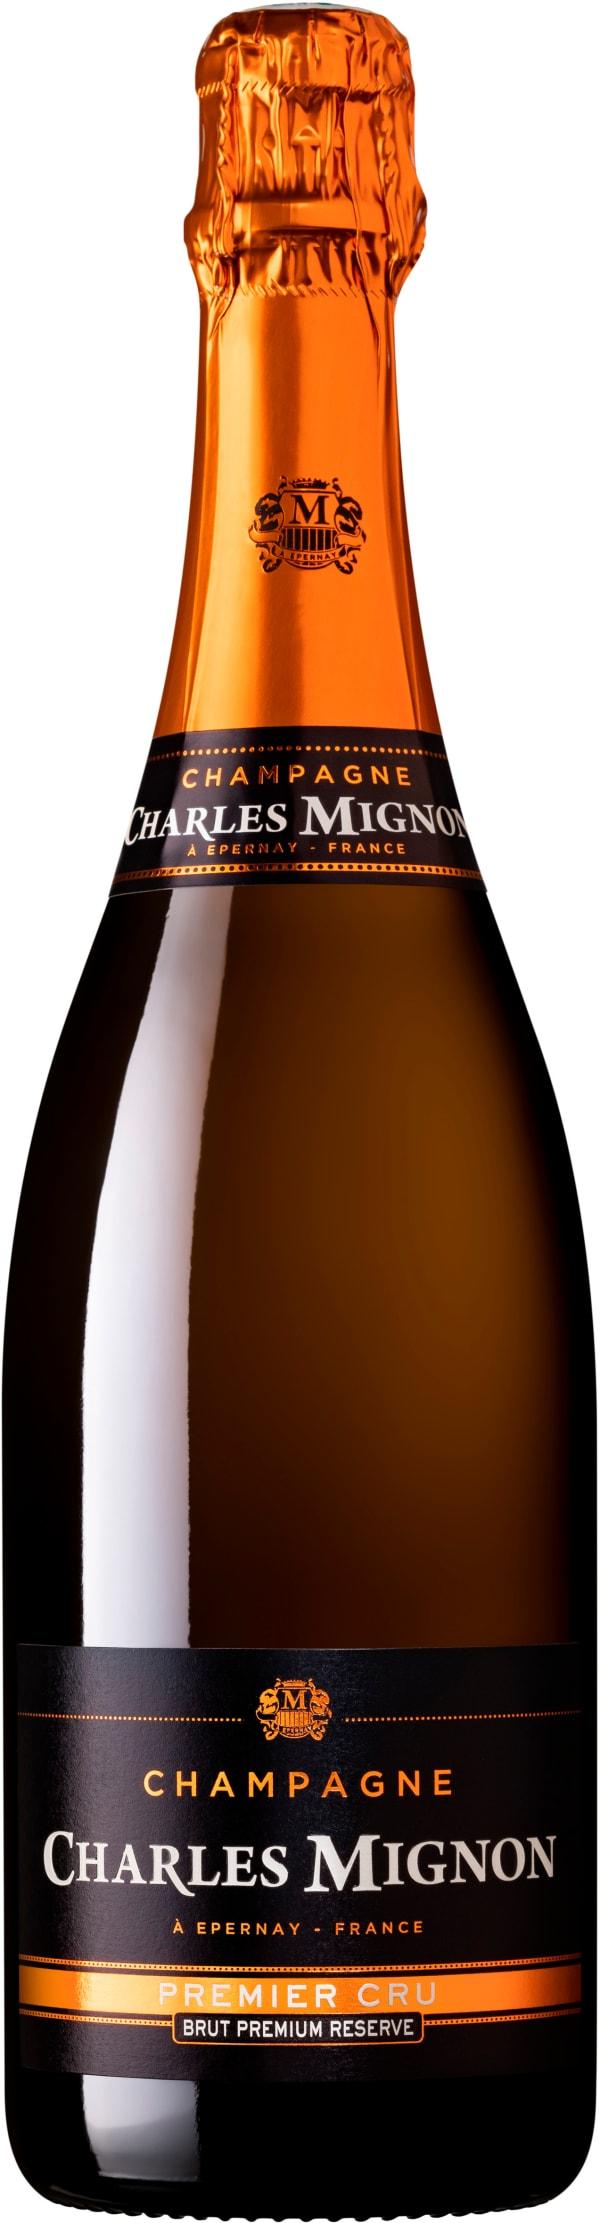 Charles Mignon Premium Cru Champagne Brut